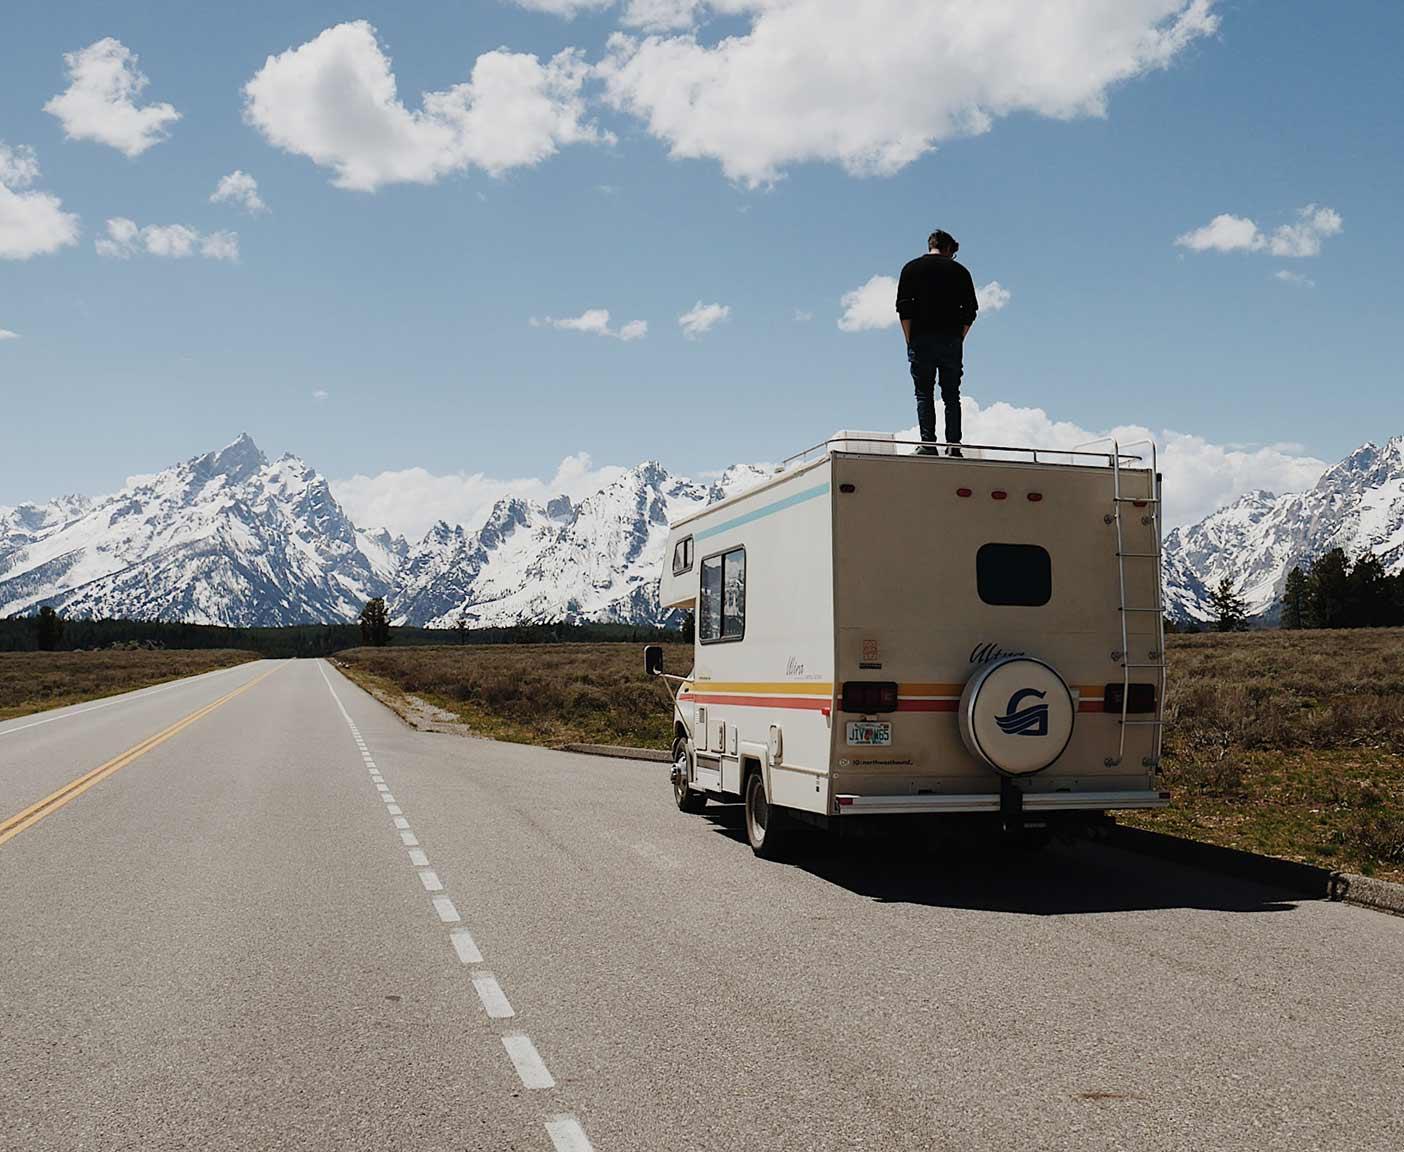 Ford-E350-Van-Wohnmobil-super-duty-usa-trip-vanlife-berge